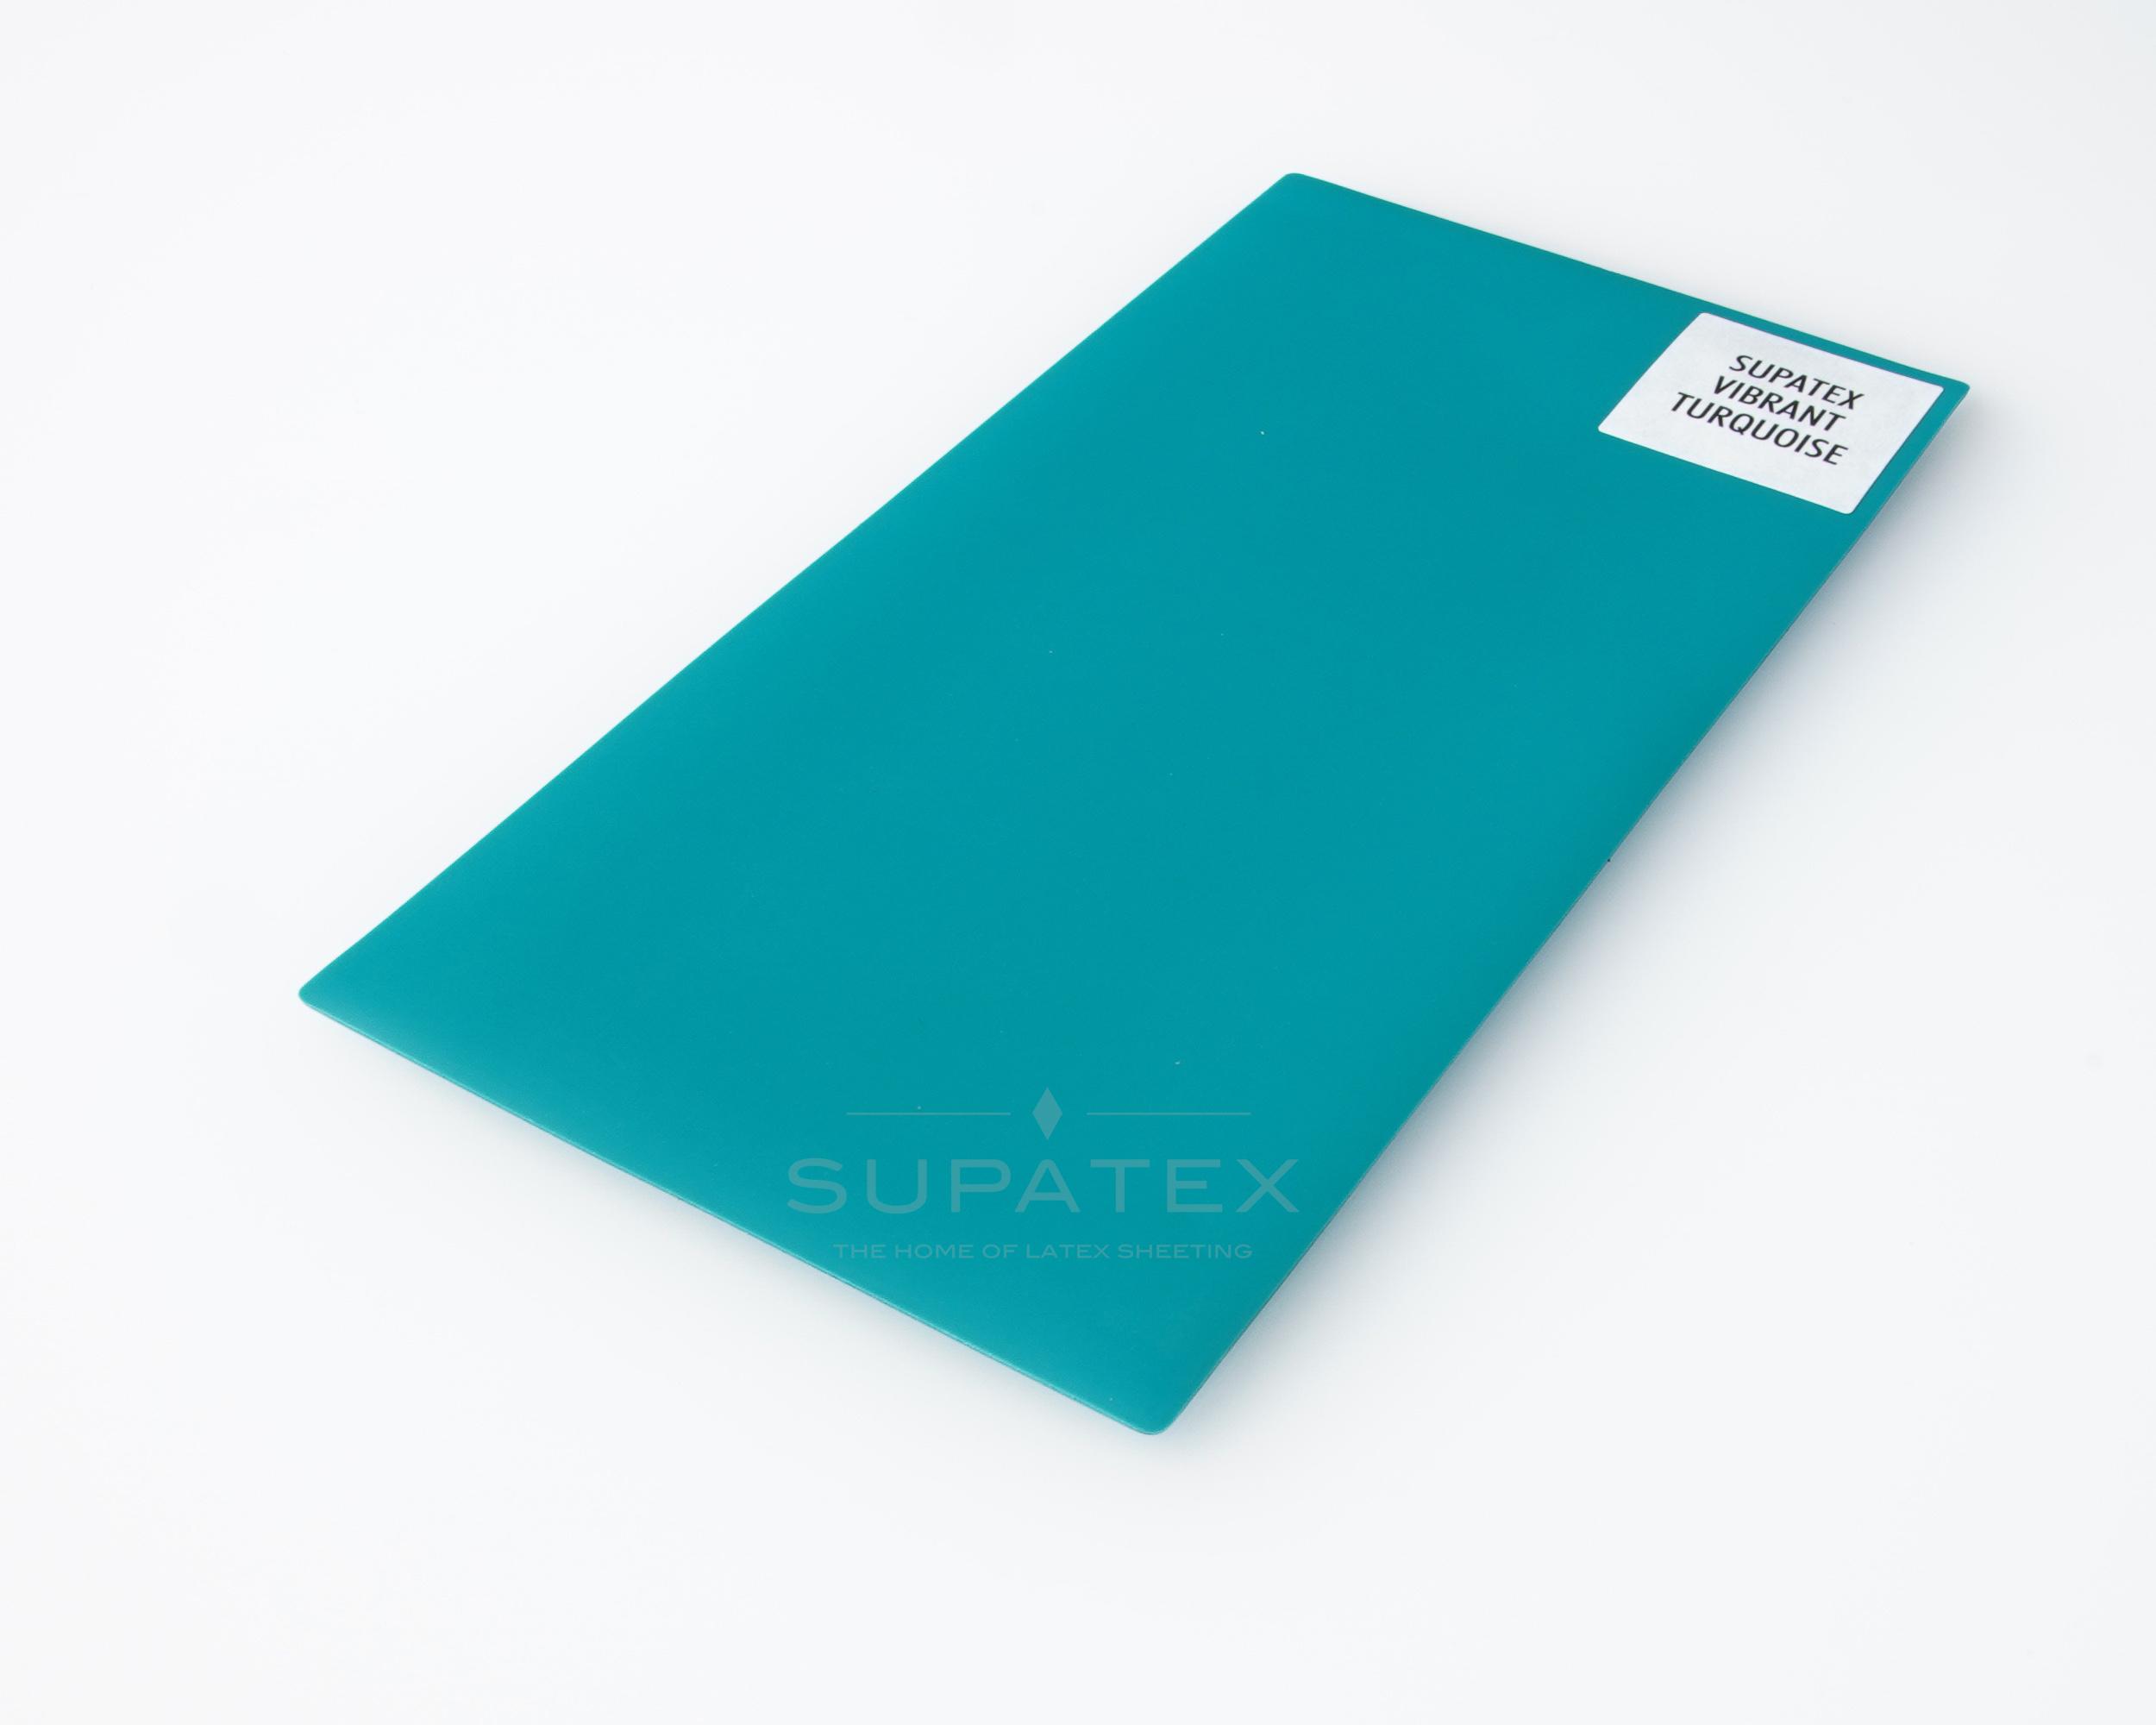 Supatex Vibrant Turquoise 0.33 mm